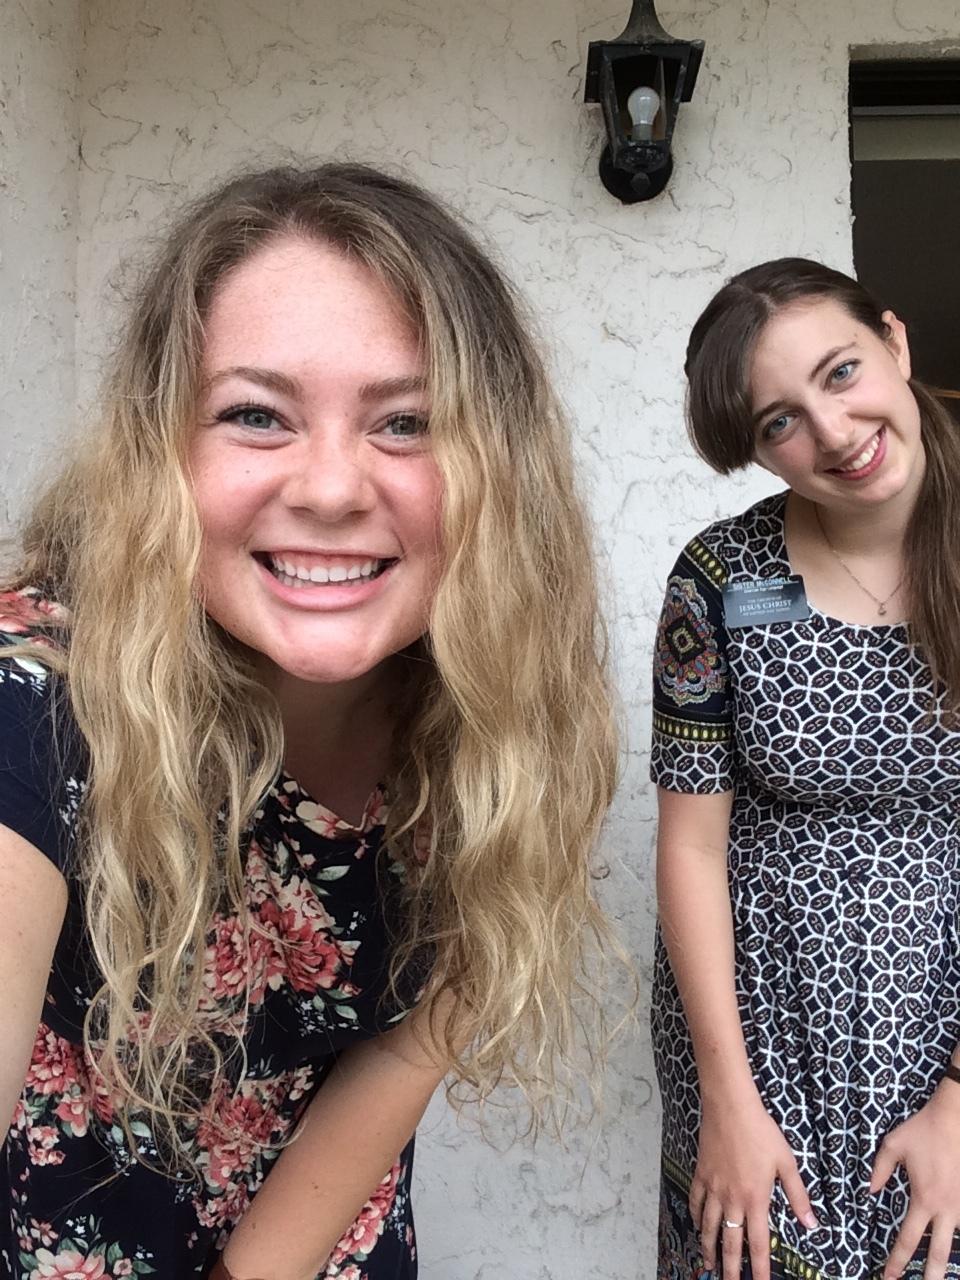 General Conference selfie